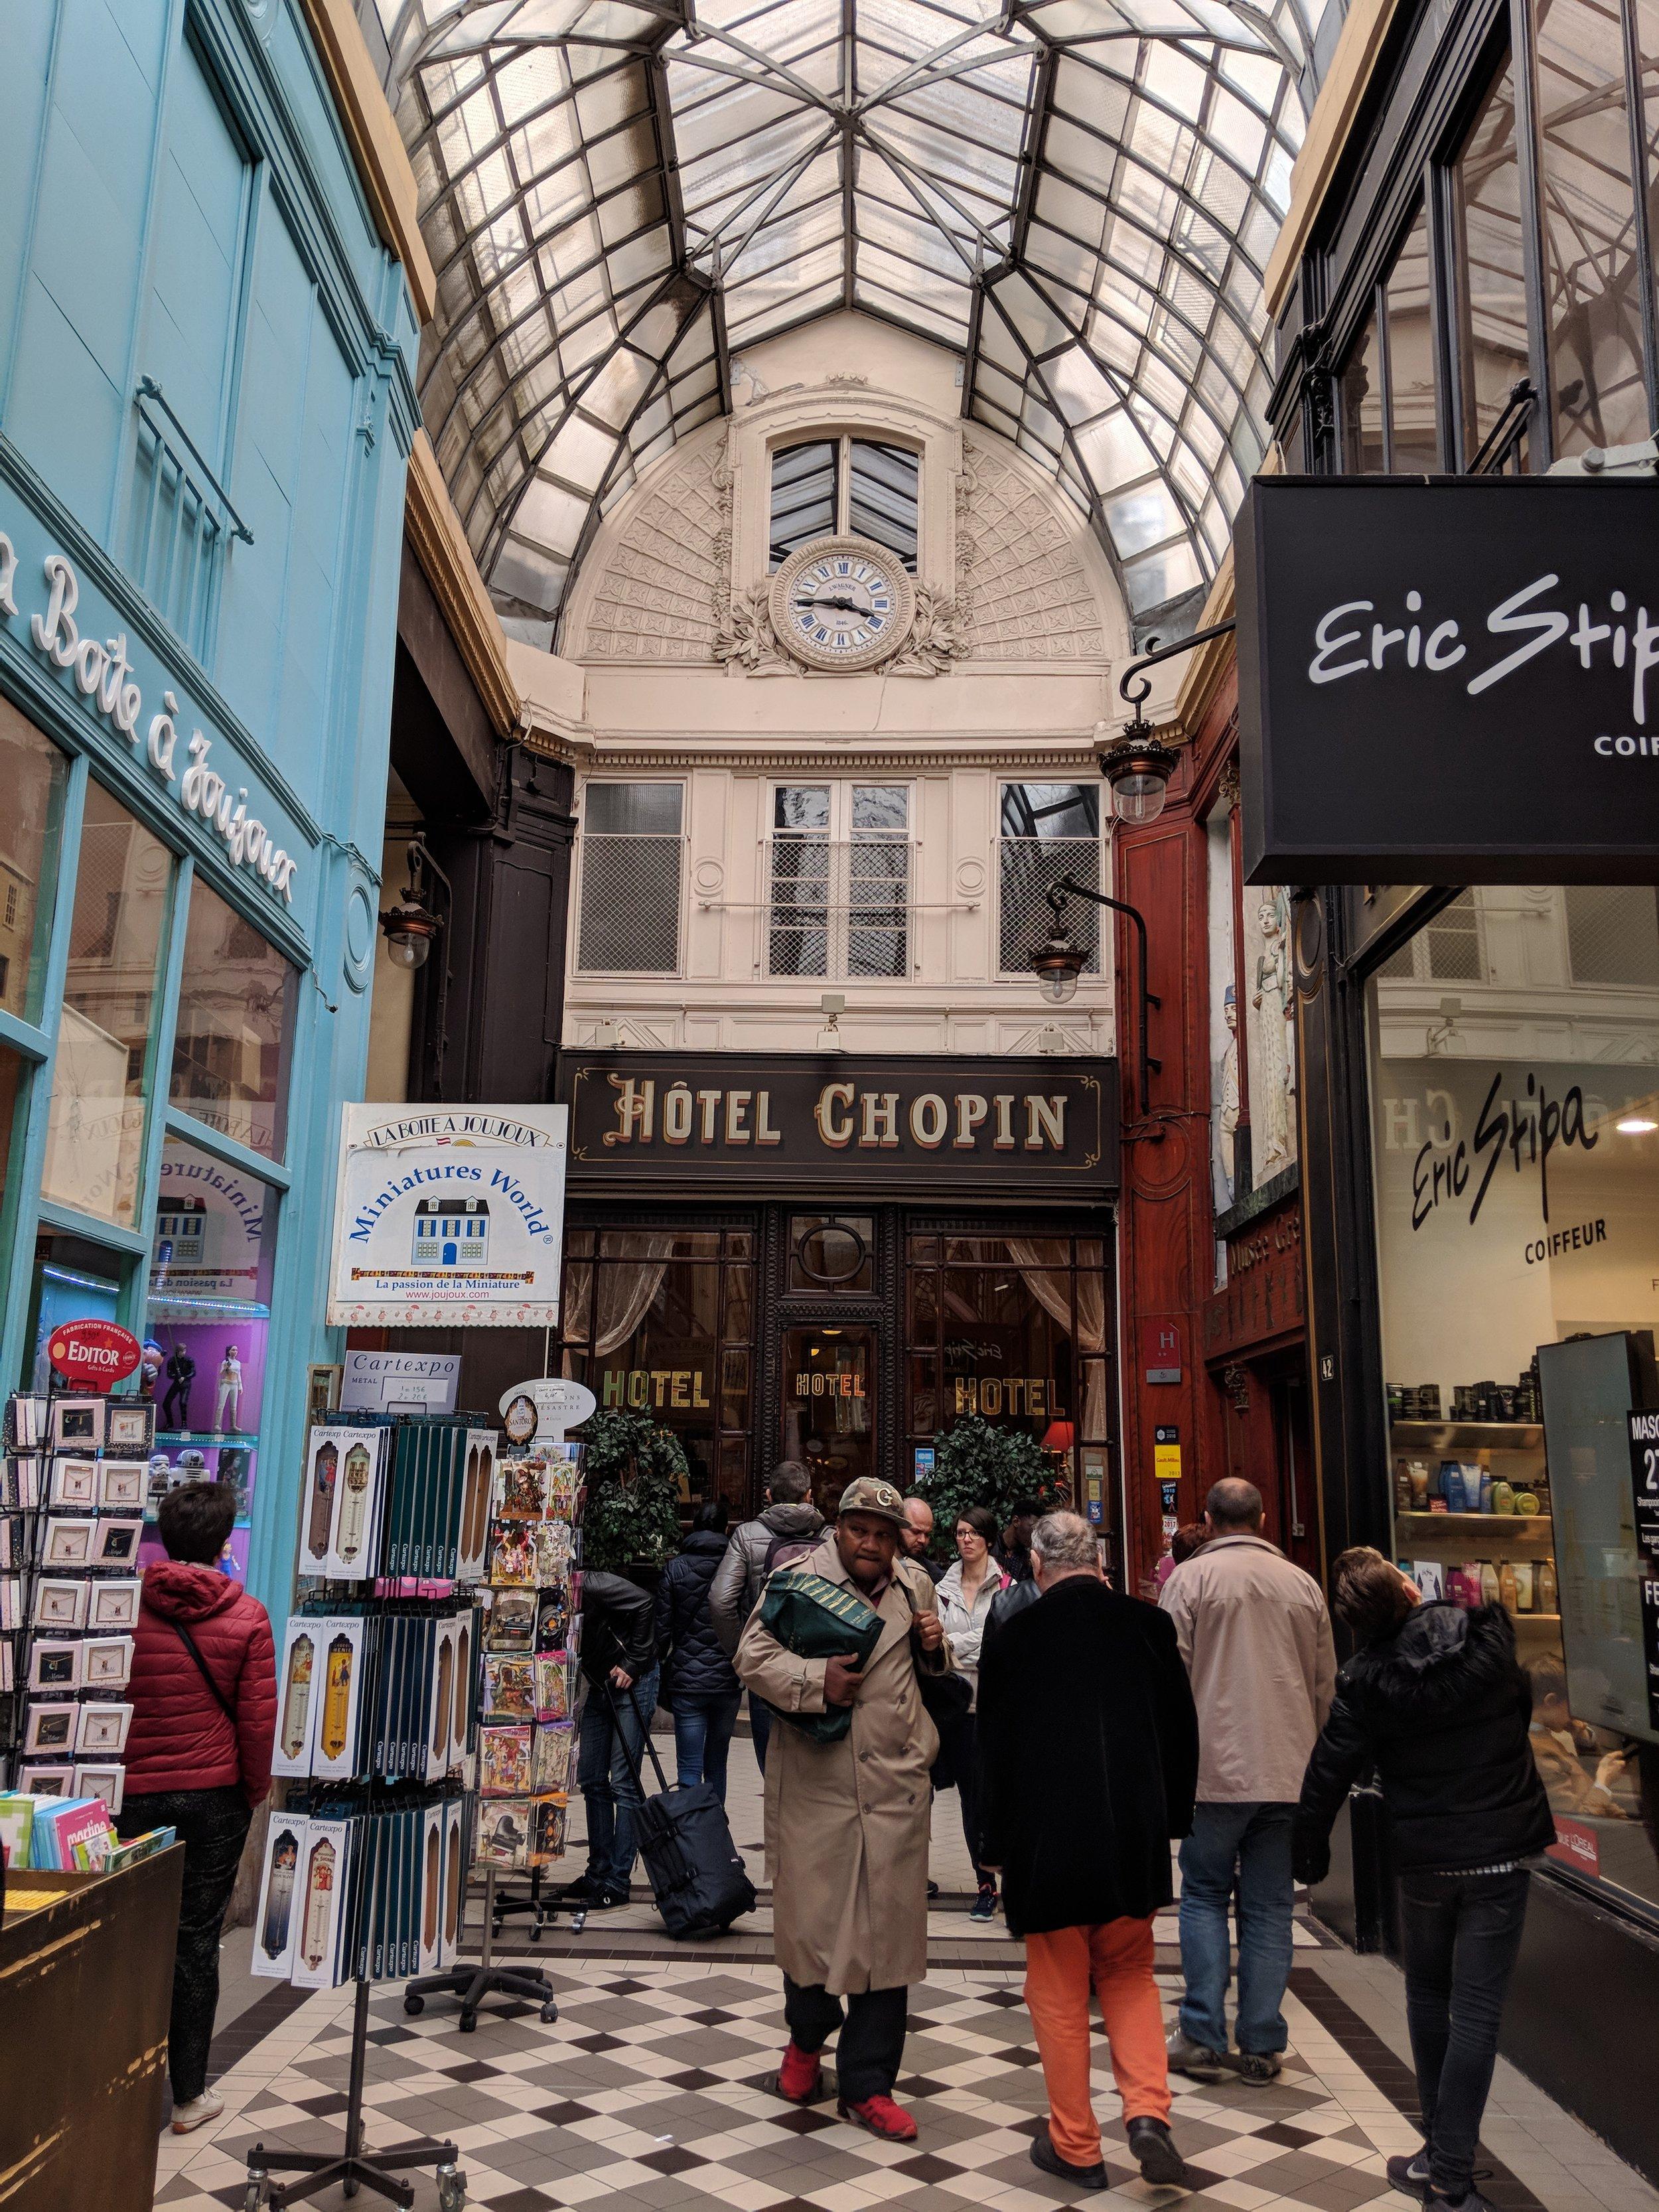 Stumbling upon alleyway markets and hidden hotels